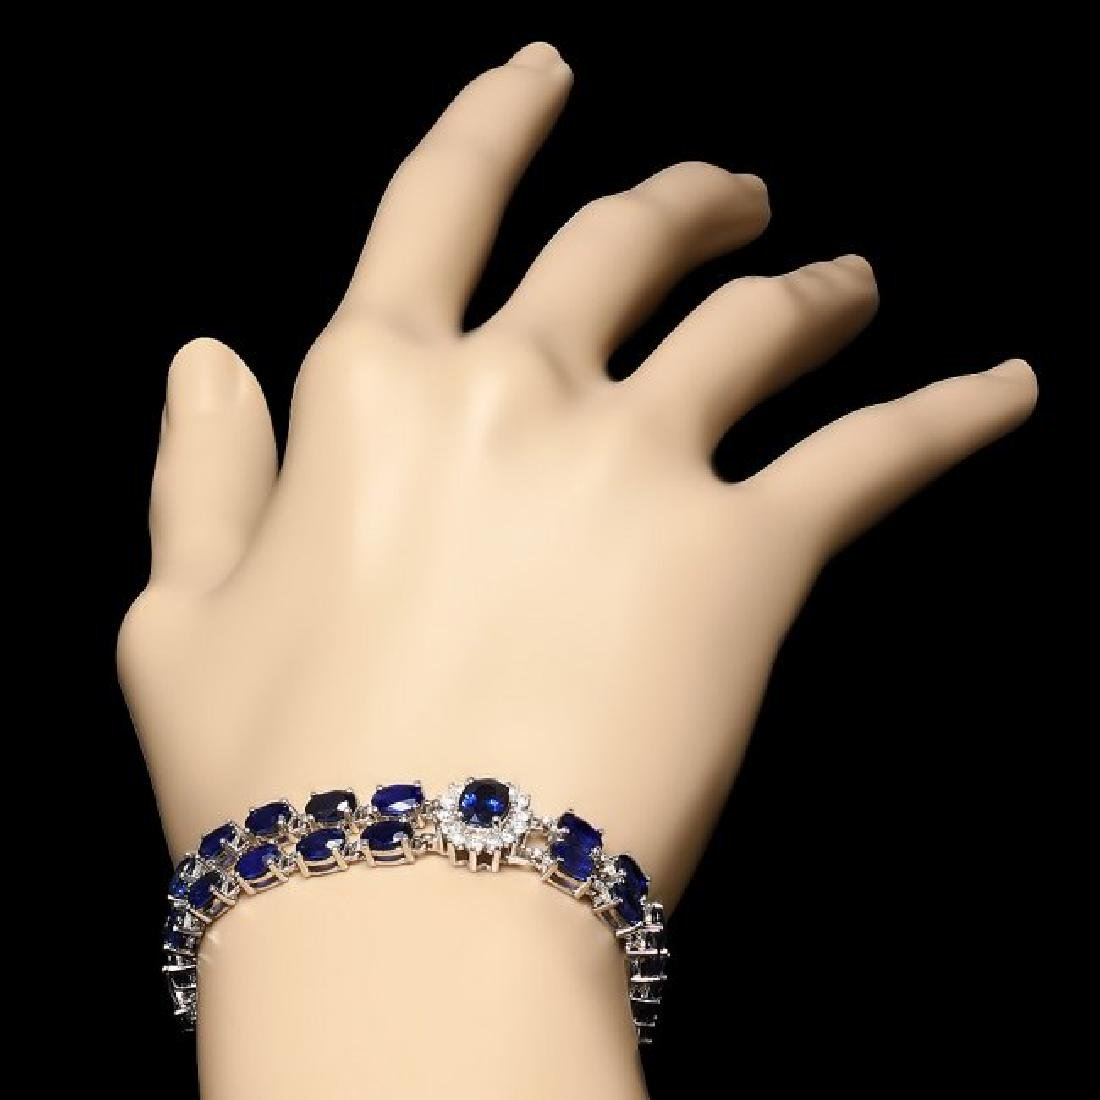 14k Gold 23.00ct Sapphire 1.50ct Diamond Bracelet - 5